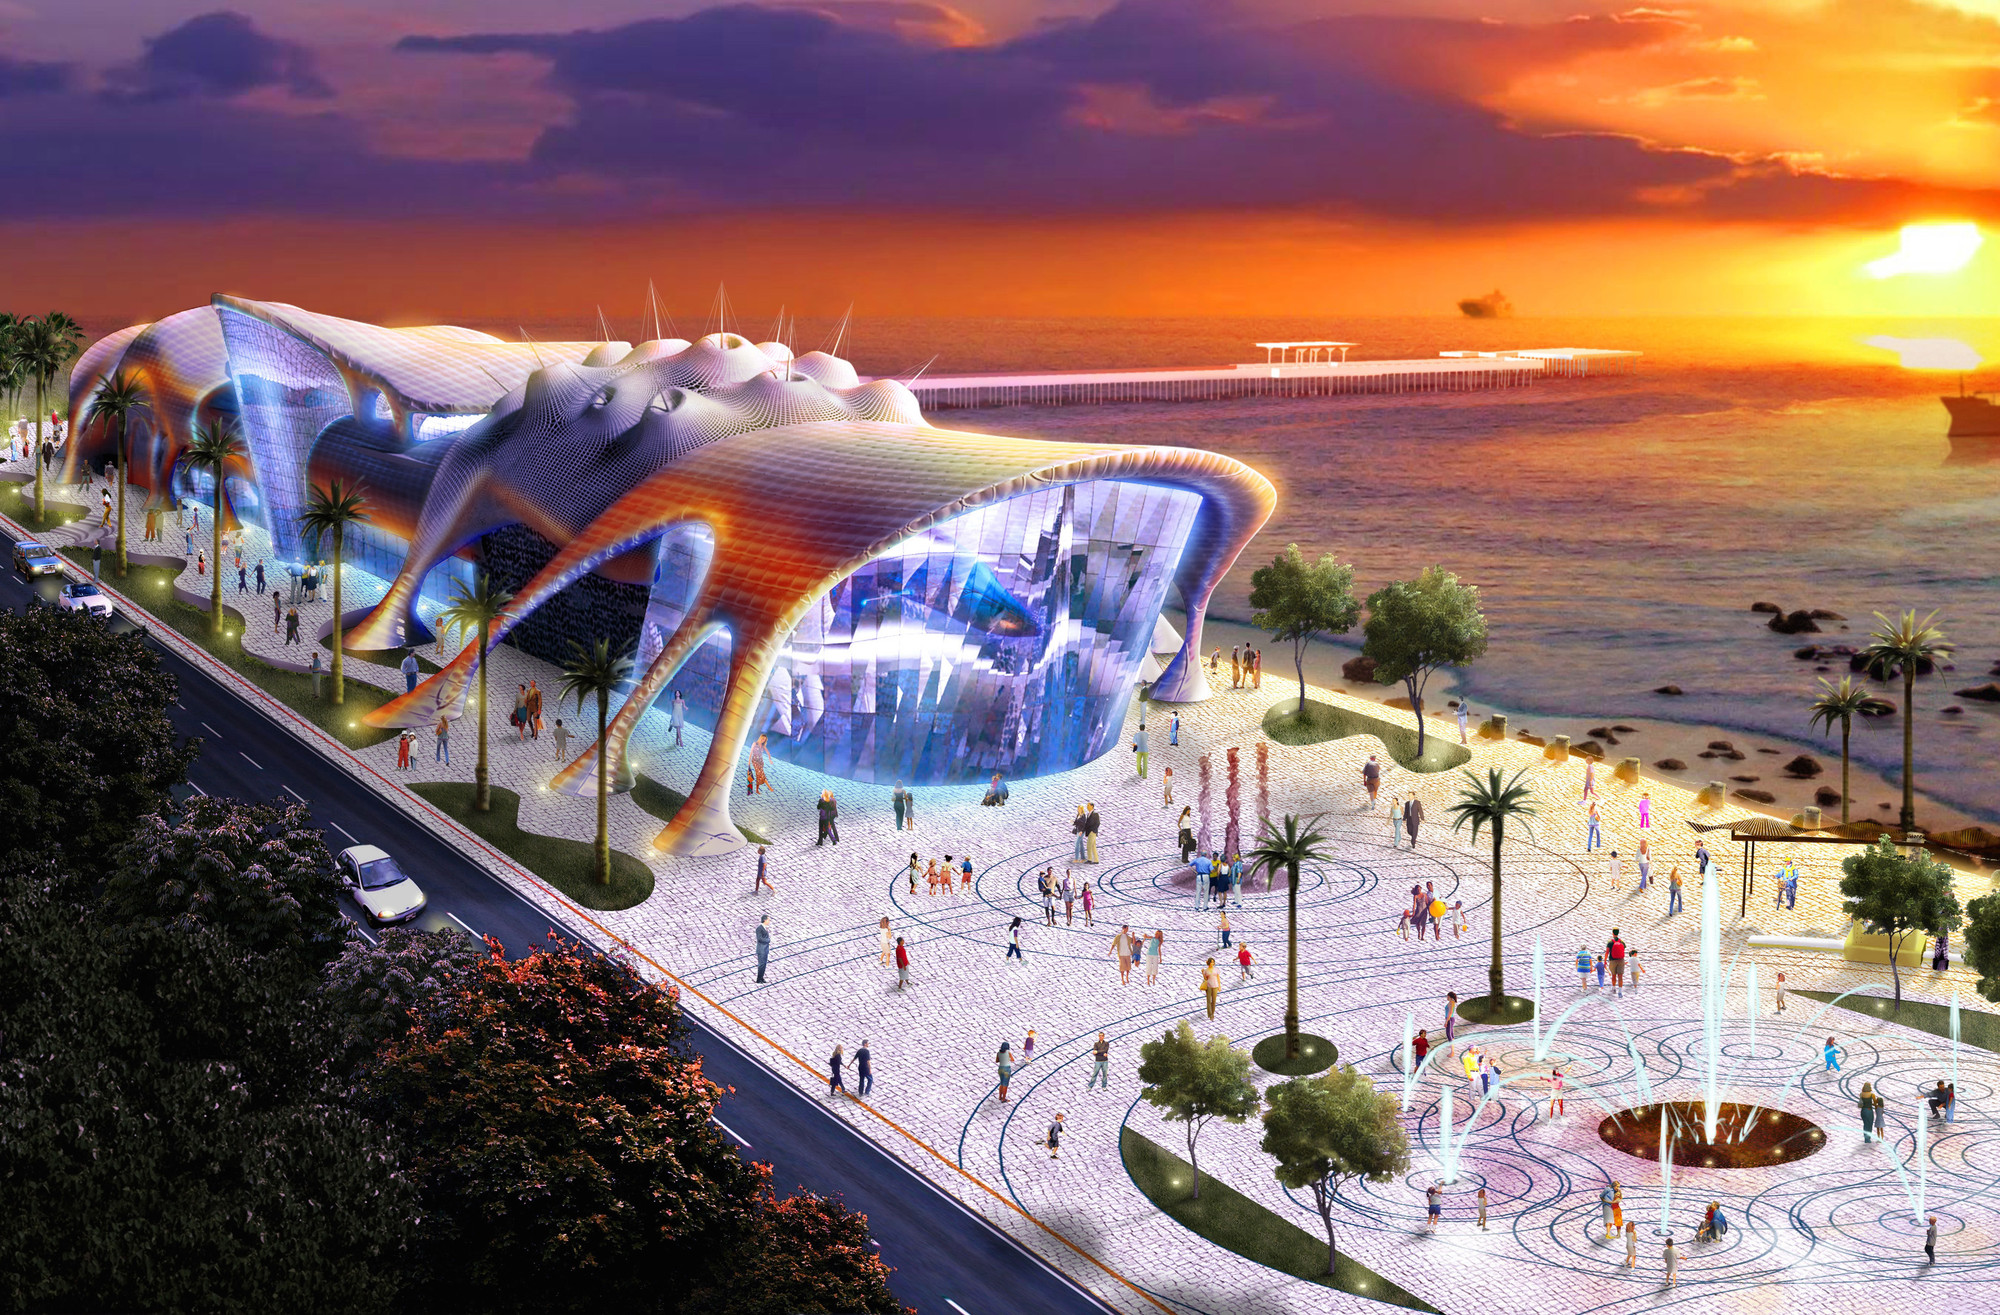 Architecture, Economics and Aquariums: Can ICM Revive the Bilbao Effect in Asia?, Acquario Ceara, Fortaleza. Image Courtesy of ICM